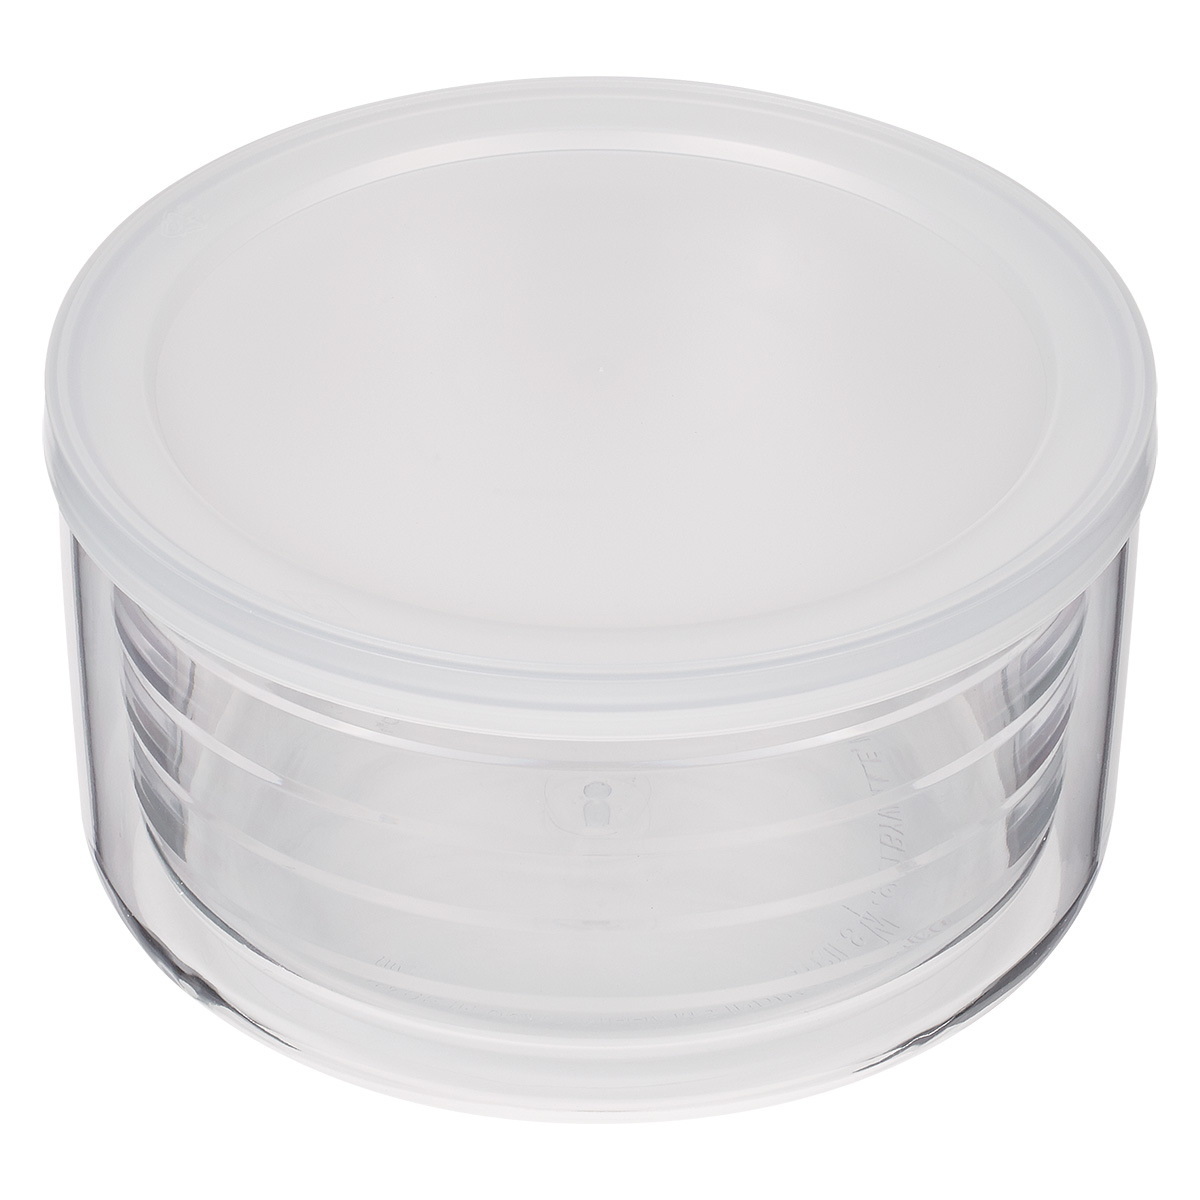 #CM 5609 - 22 Oz. Tritan™ Food Storage Bowl